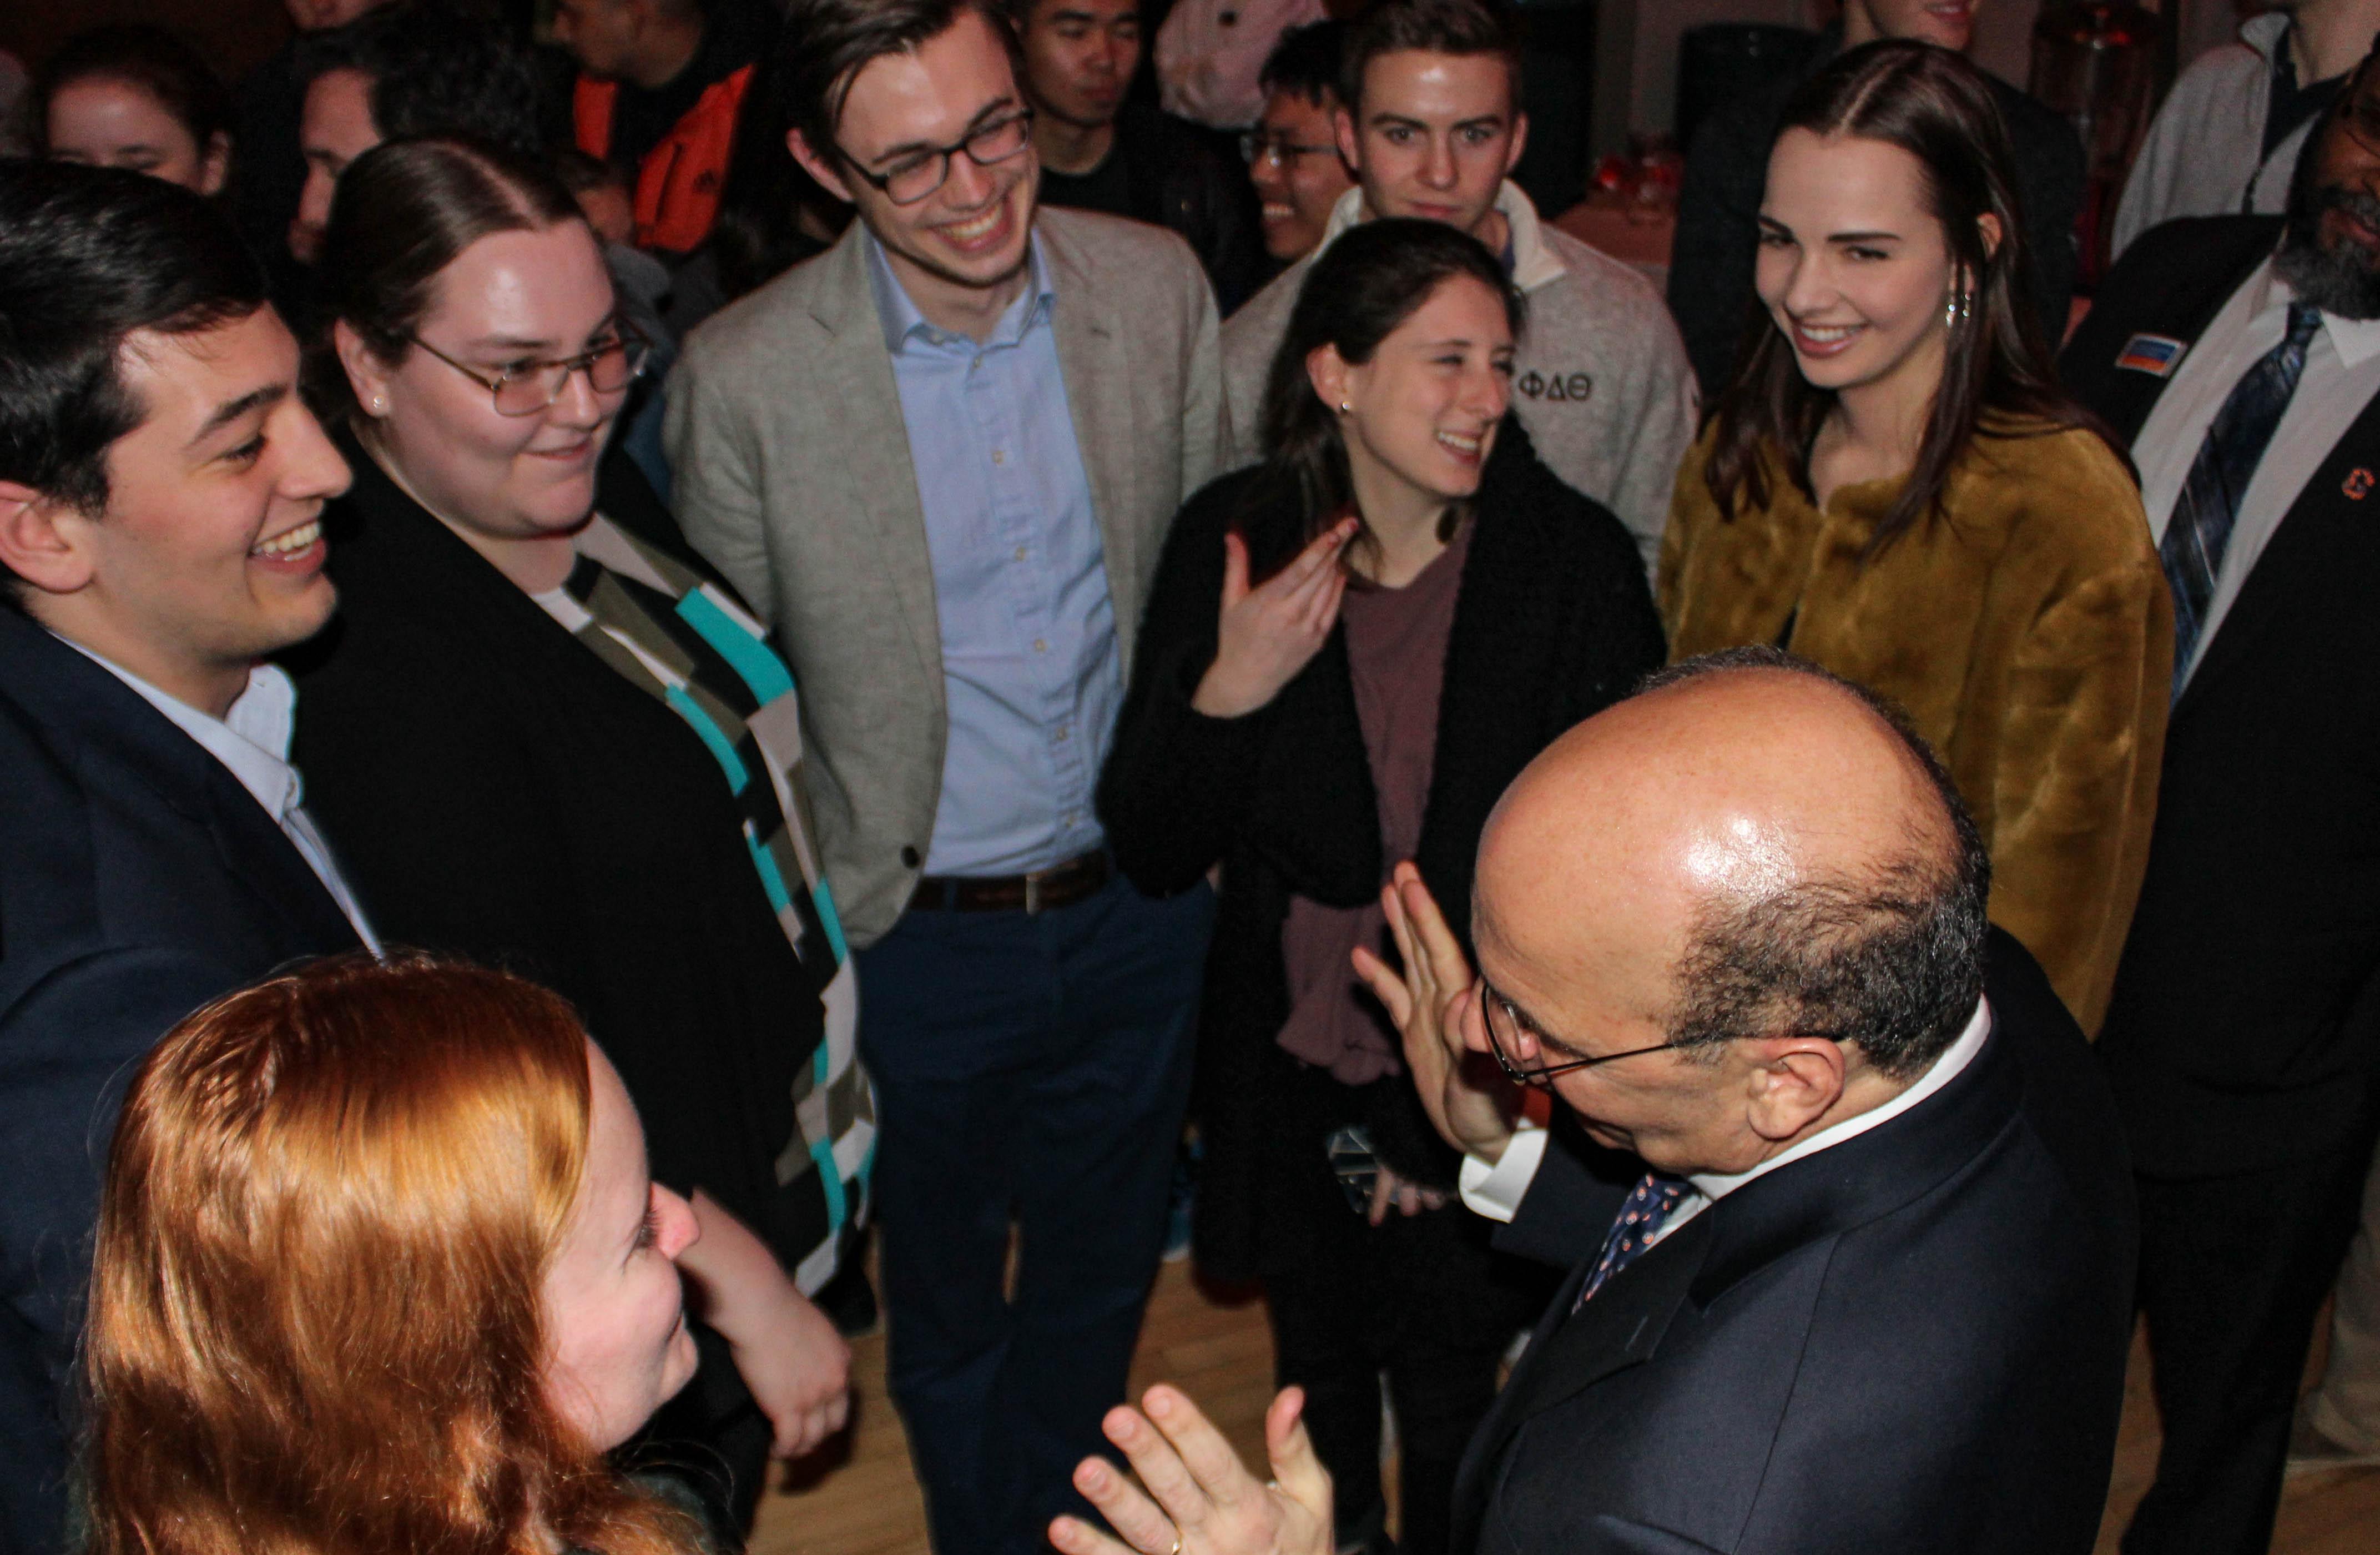 Robert Iuliano converses with members of the Student Senate Executive Board Abigail Hauer '21 (L), Nick Arbaugh '20, Grace Wenzel '21, Patrick Custer '19, Haley Gluhanich '19, and Marisa Balanda '21 (Photo Sam Hann/The Gettysburgian)